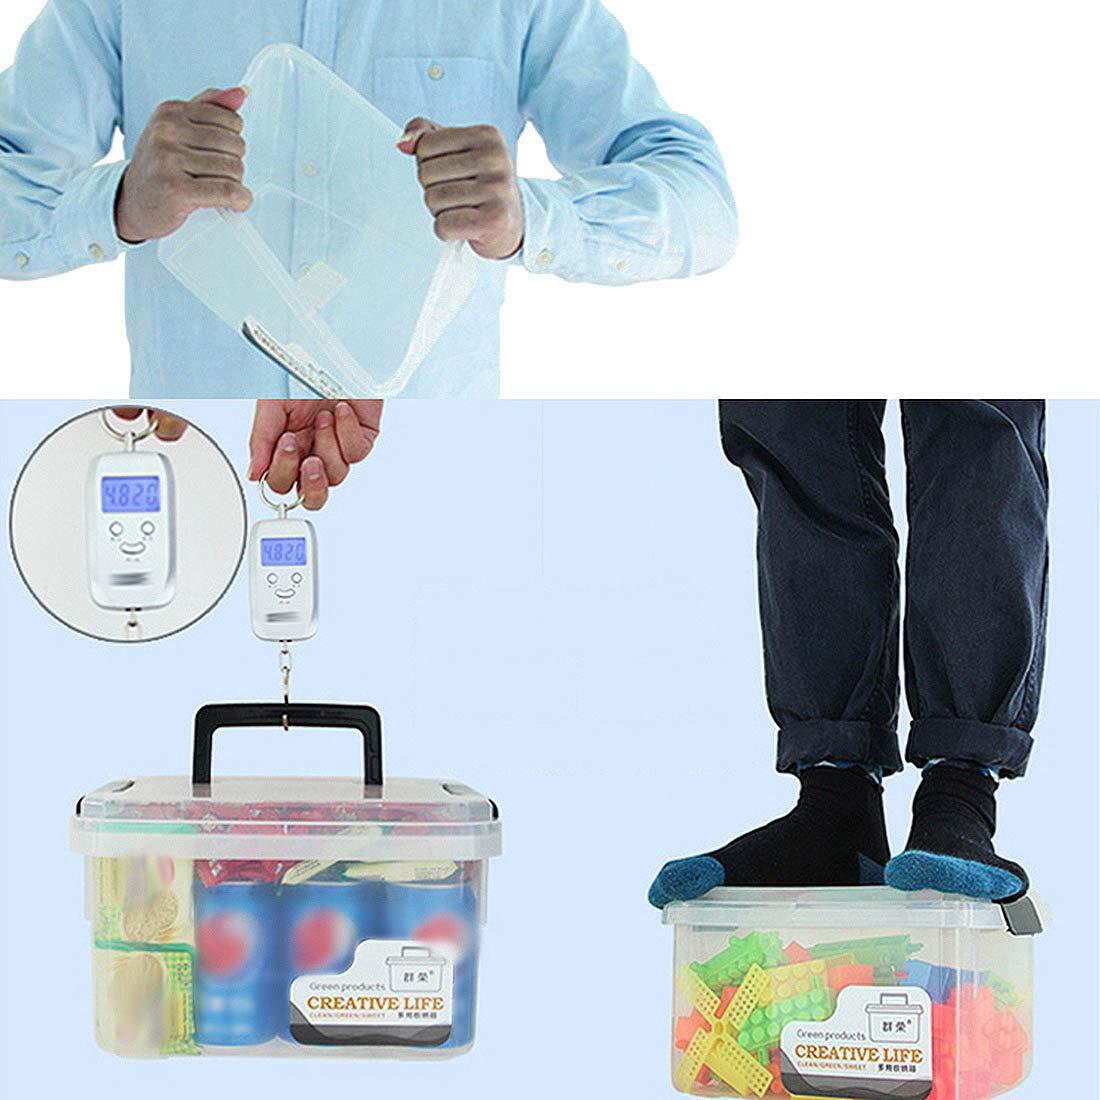 Jiyaru Caja Botiqu/ín Primeros Auxilios con Tapa de Gran Capacidad Botiqu/ín de Primeros Auxilios Estuche M/édico Port/átil para Familiar Caja de Almacaneje Amarillo S